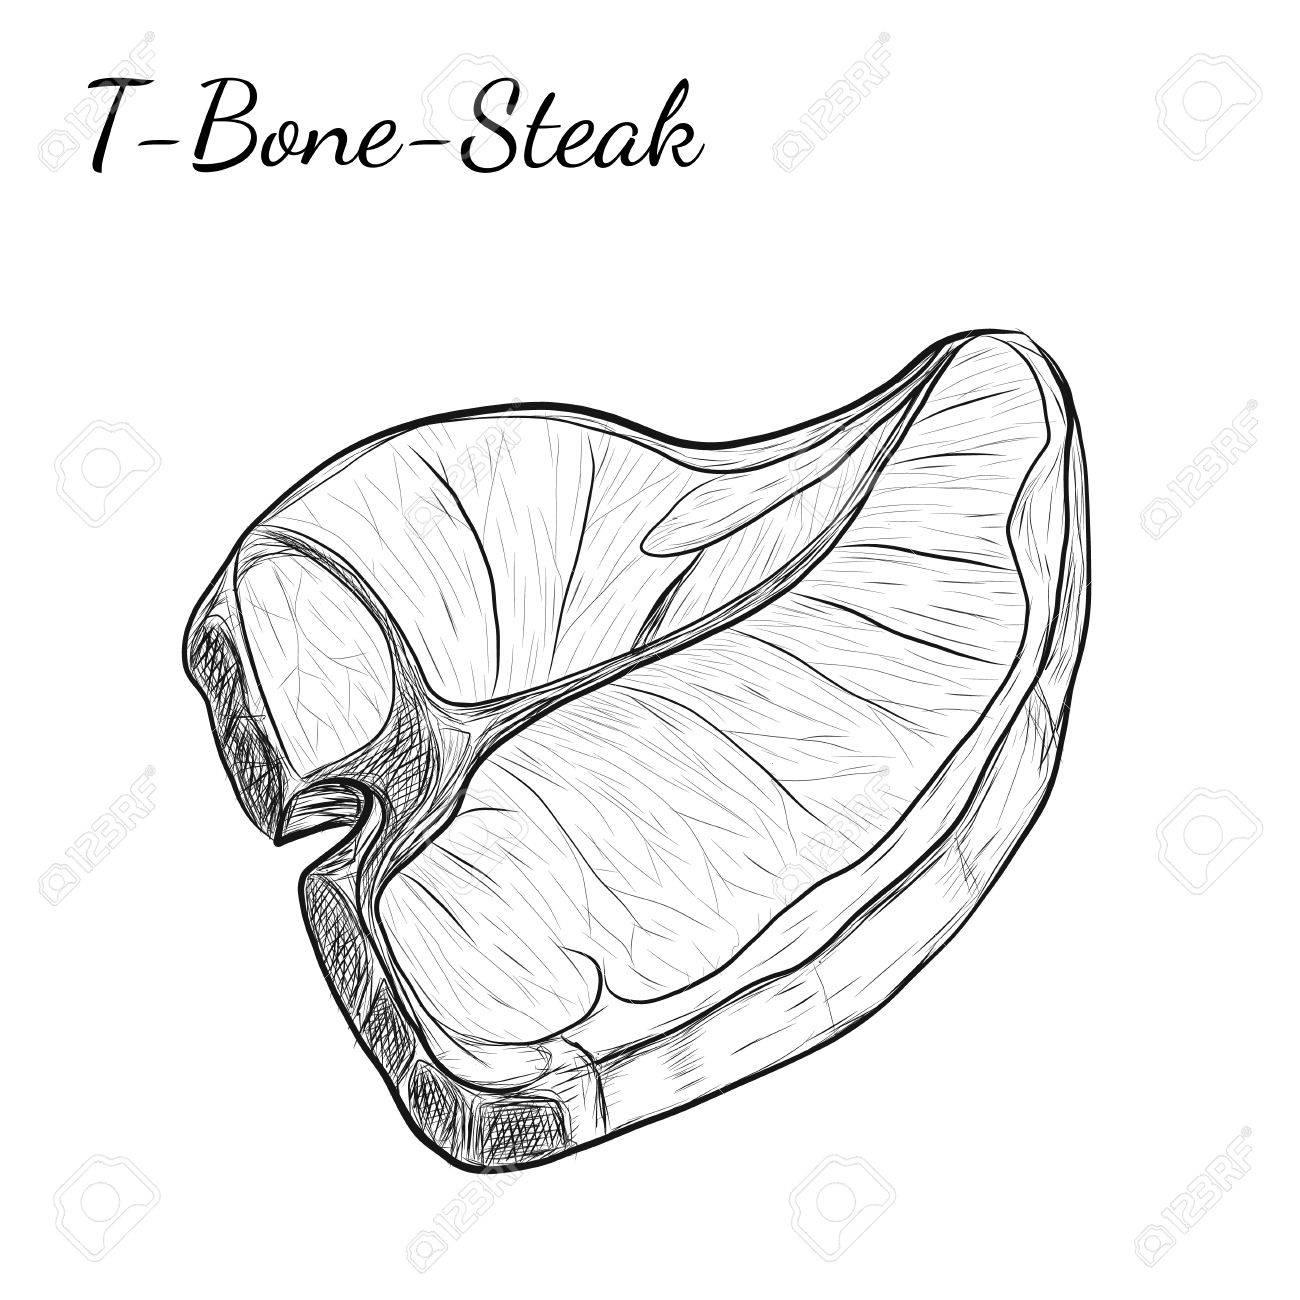 1300x1300 Hand Drawn Sketch T Bone Steak. Isolated Vector Food Illustration